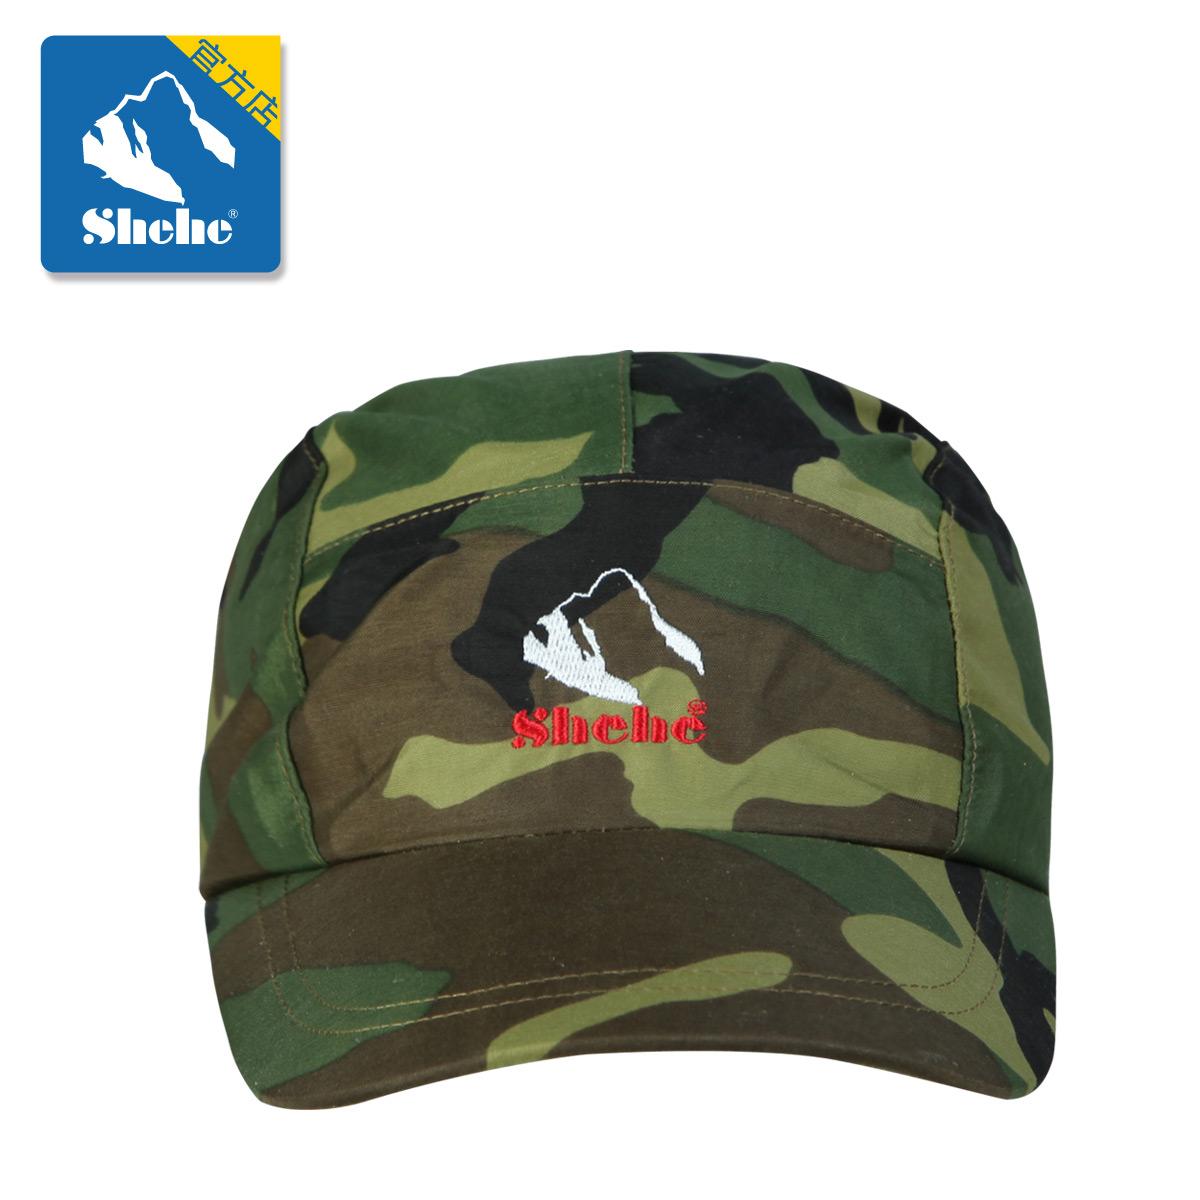 Шапки и кепки для туризма и кемпинга Shehe 34503 Shehe / pole star